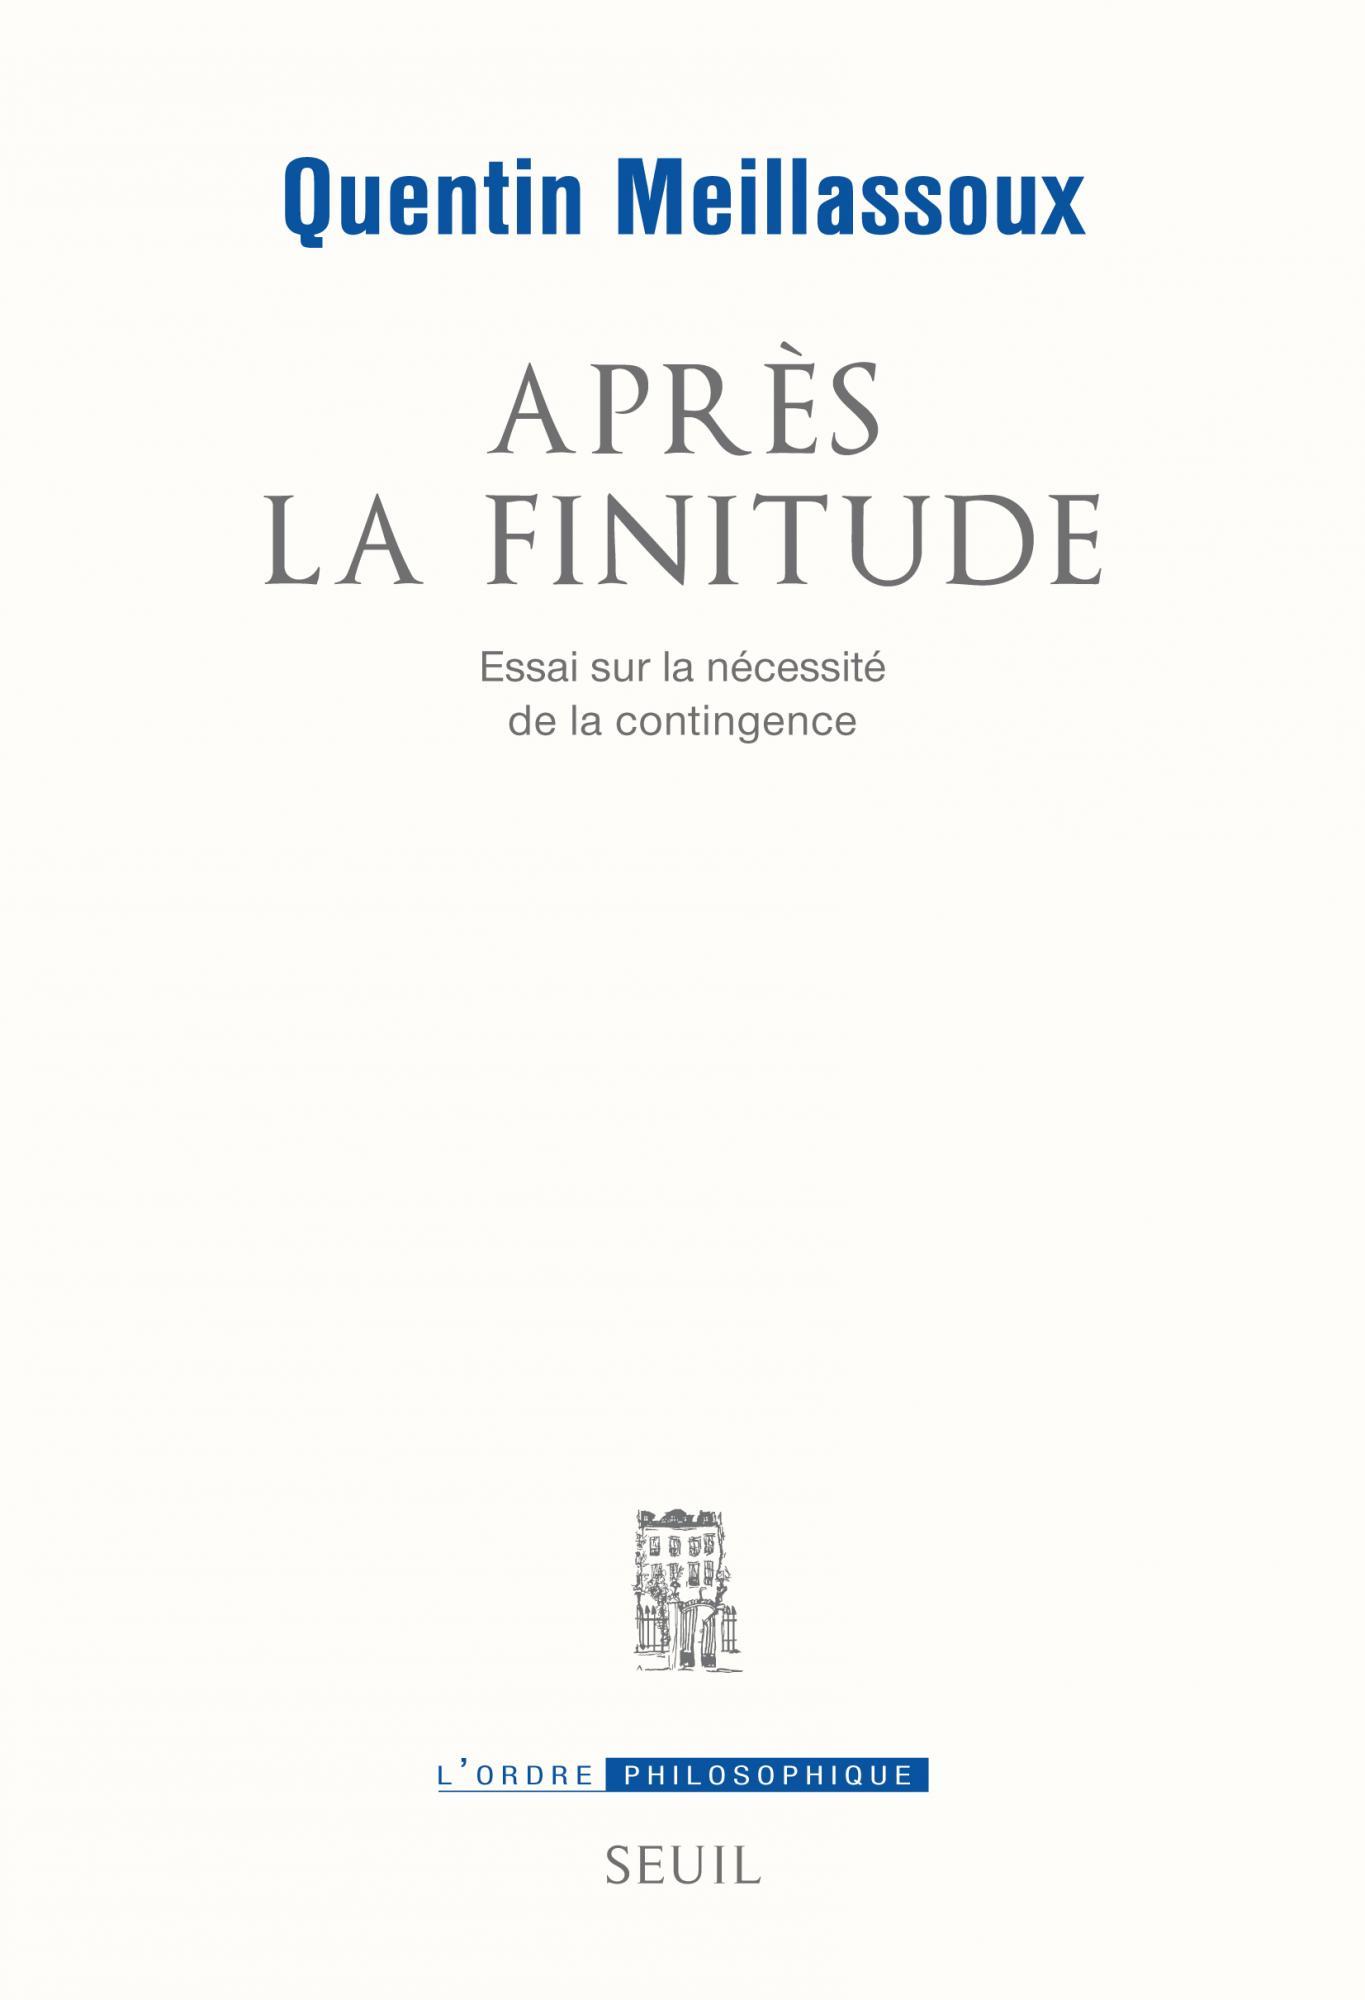 meillassoux_apres_la_finitude_2-2.jpg